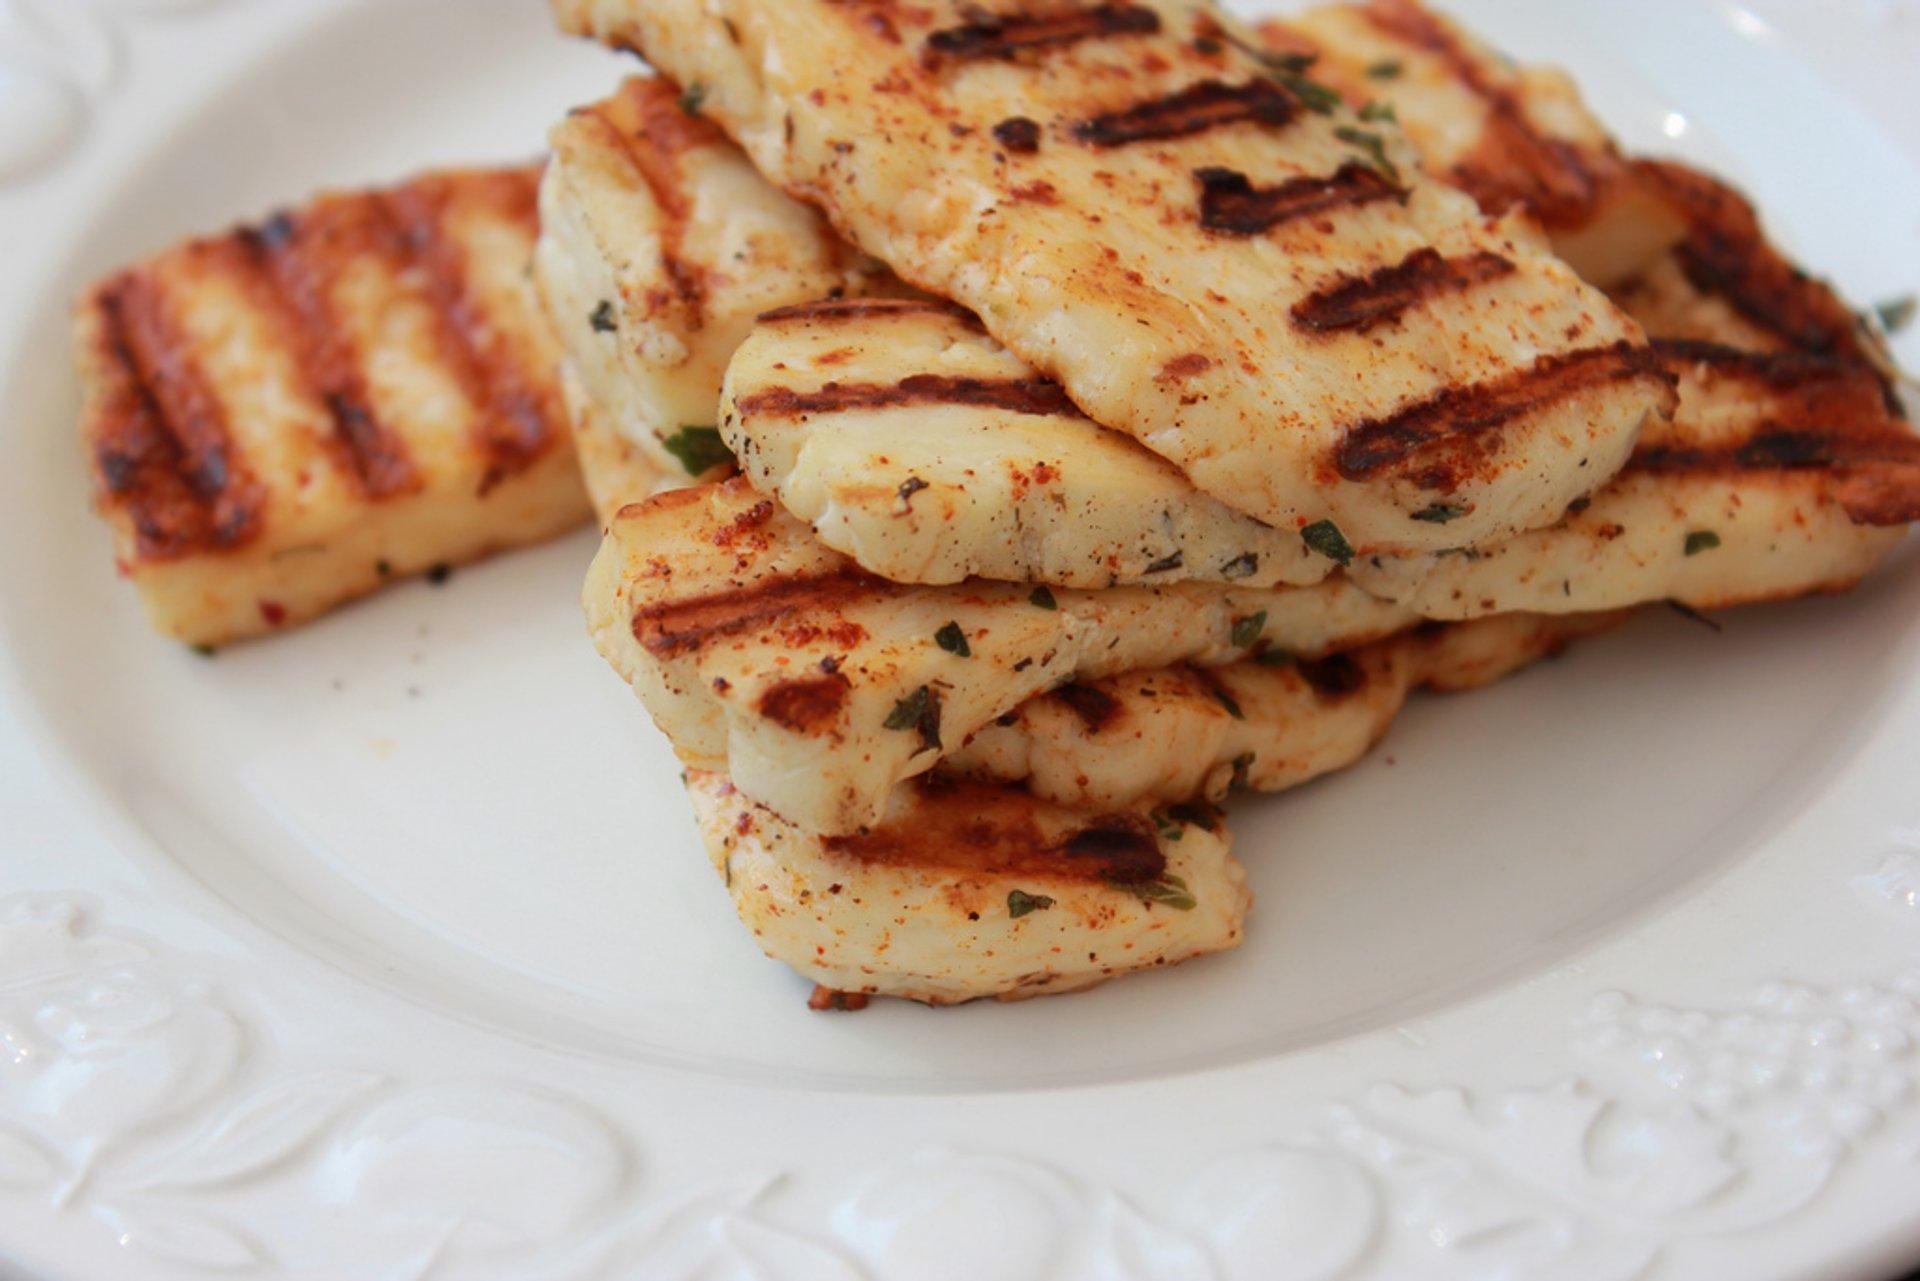 Fresh Halloumi Cheese in Cyprus - Best Season 2019